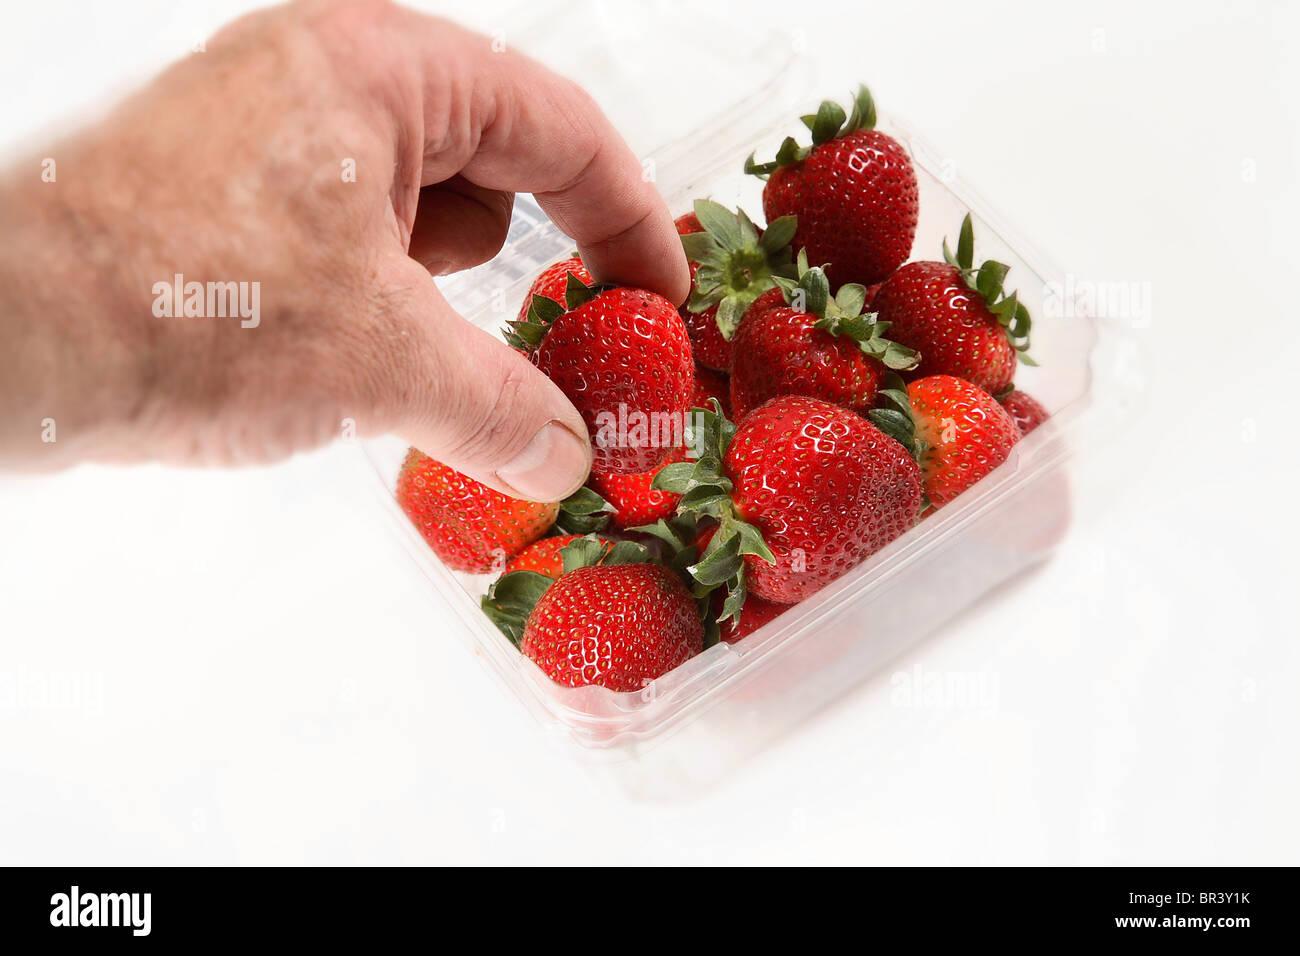 Hombre mano recogiendo una fresa de un punnett o cesta de fresas Imagen De Stock